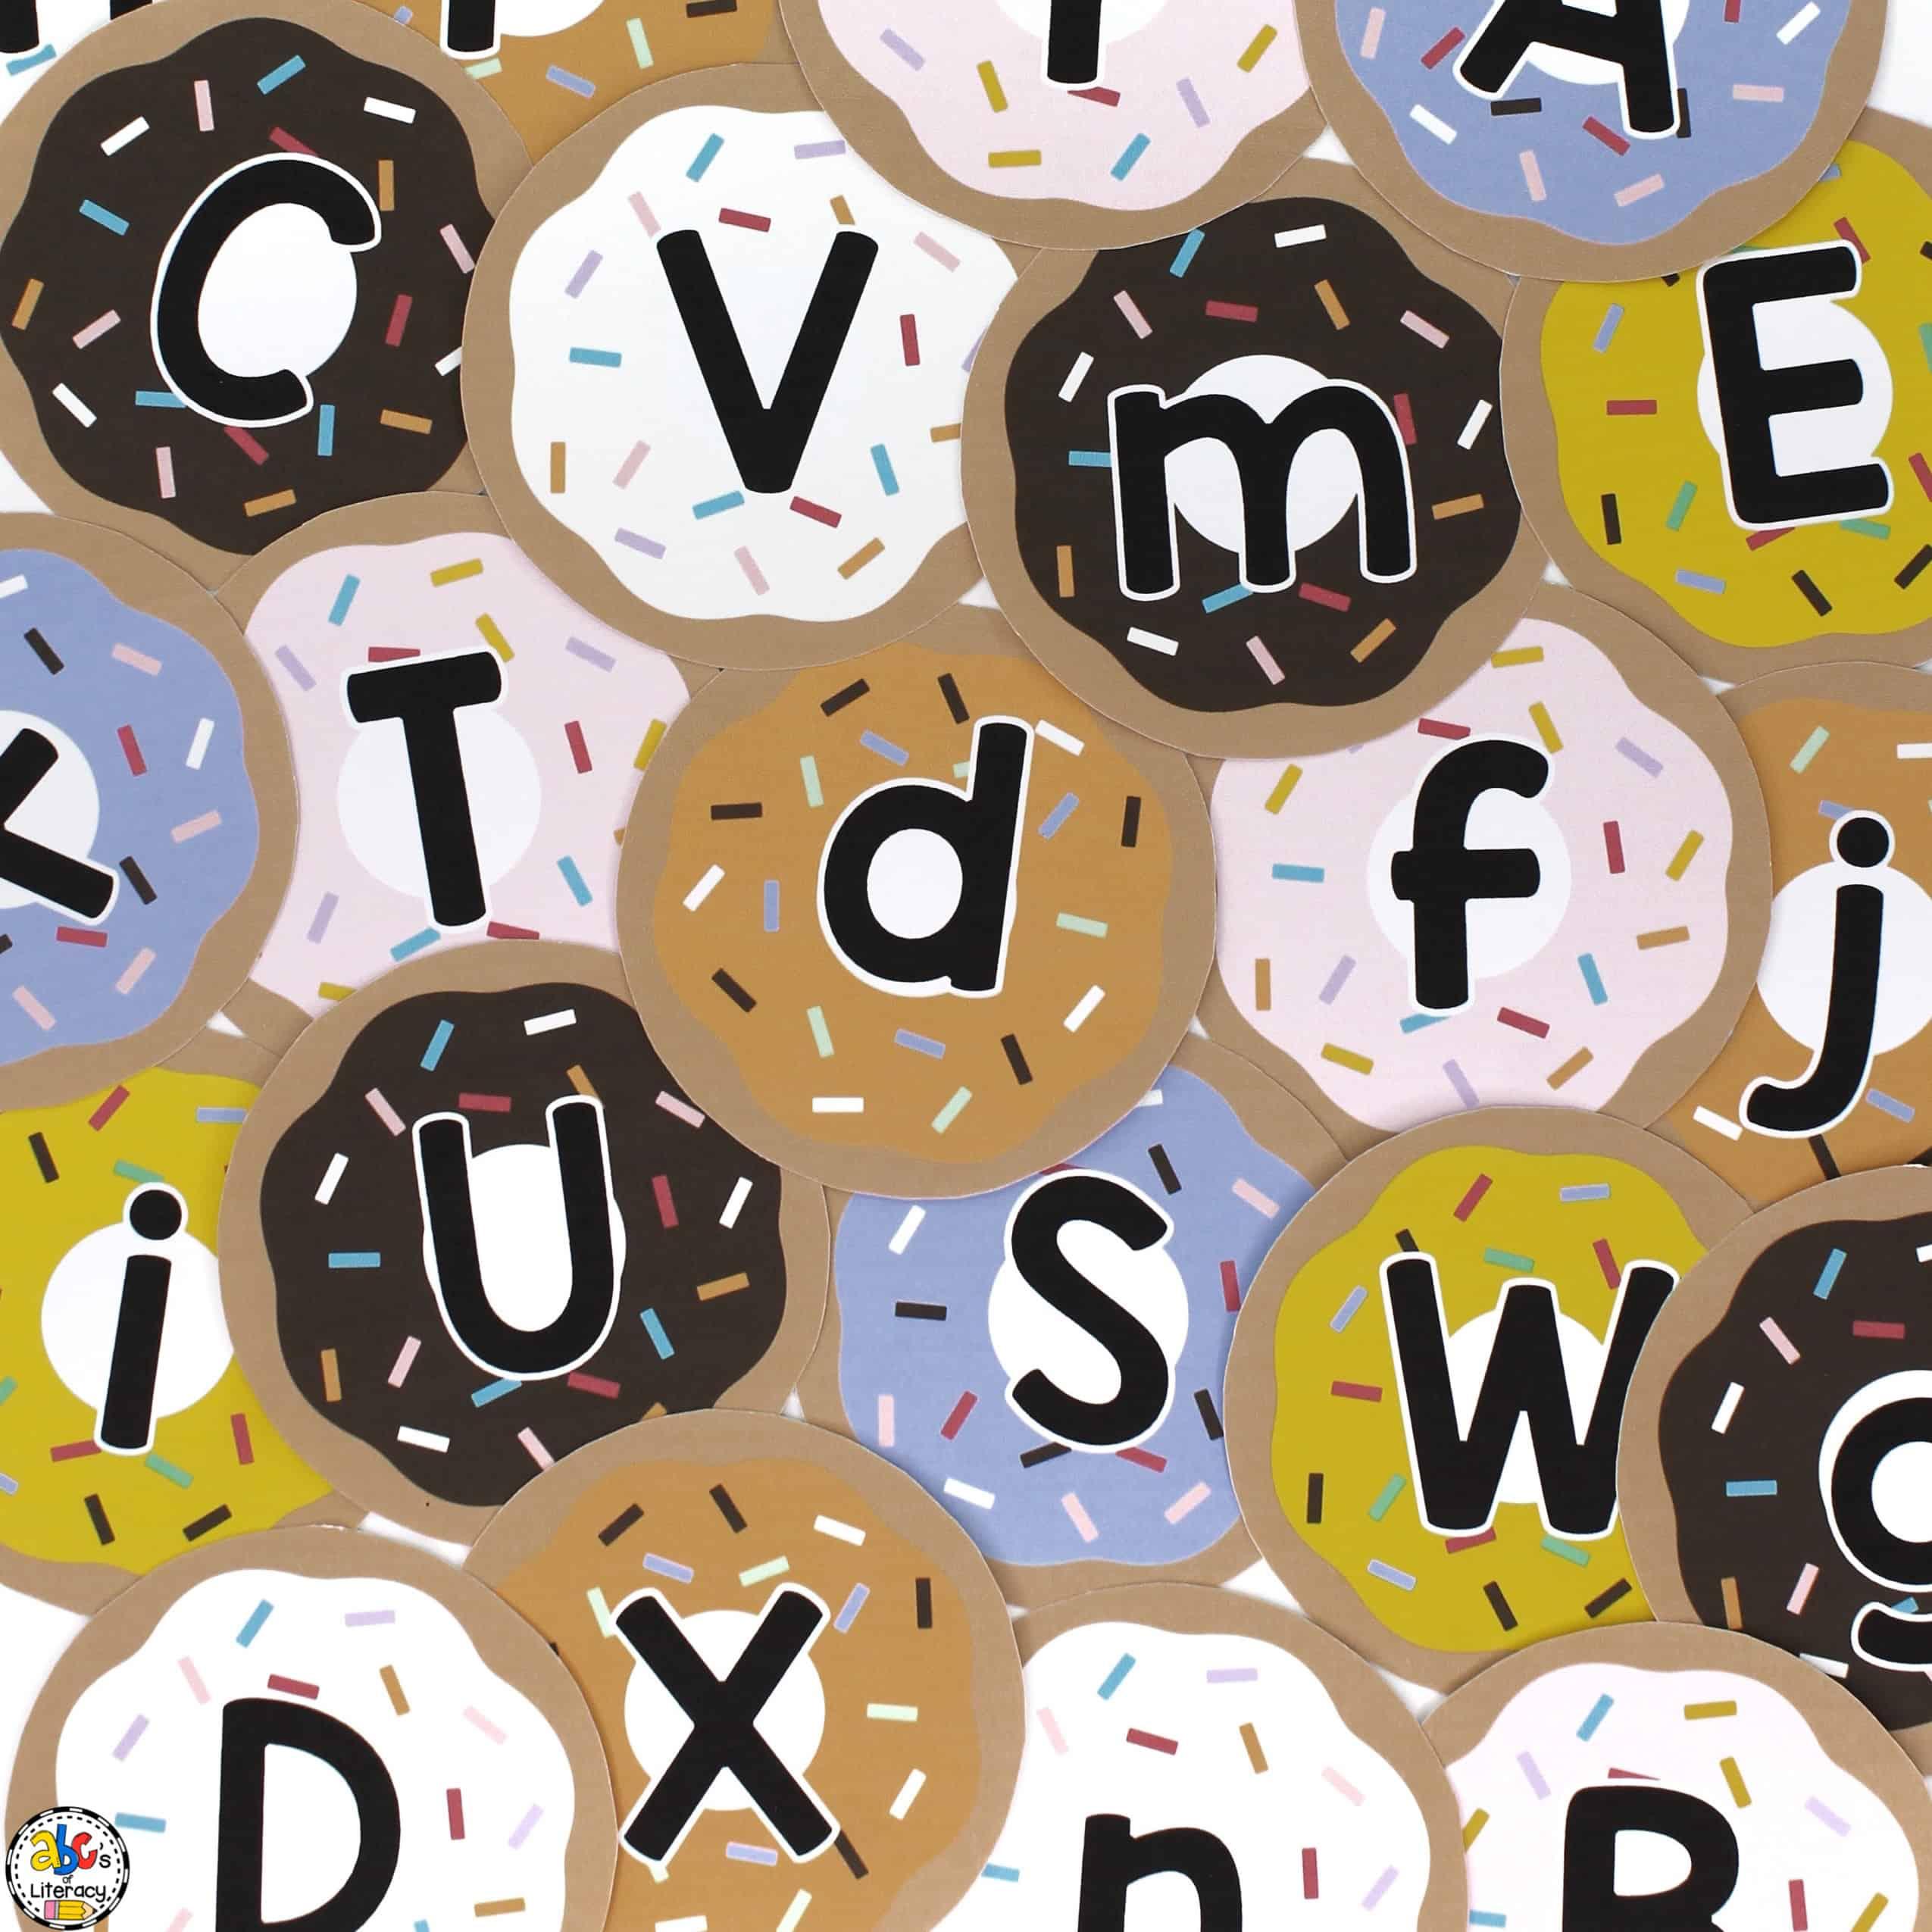 Doughnut Shop Letter Recognition Game